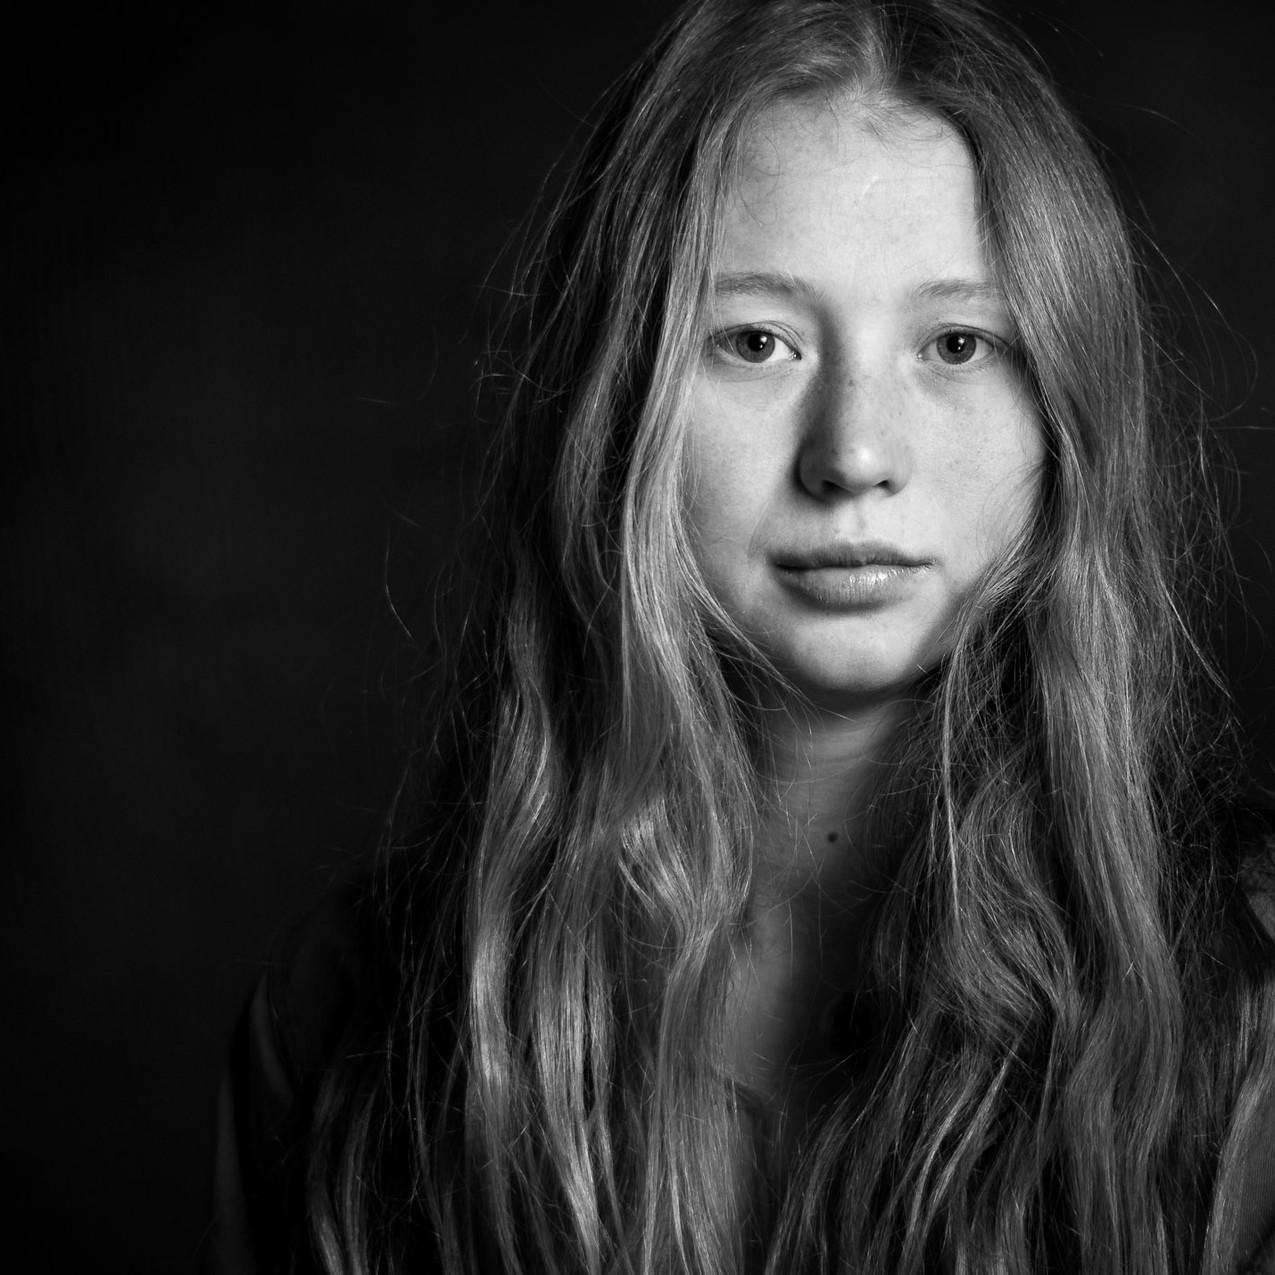 Anna_Portrait#1